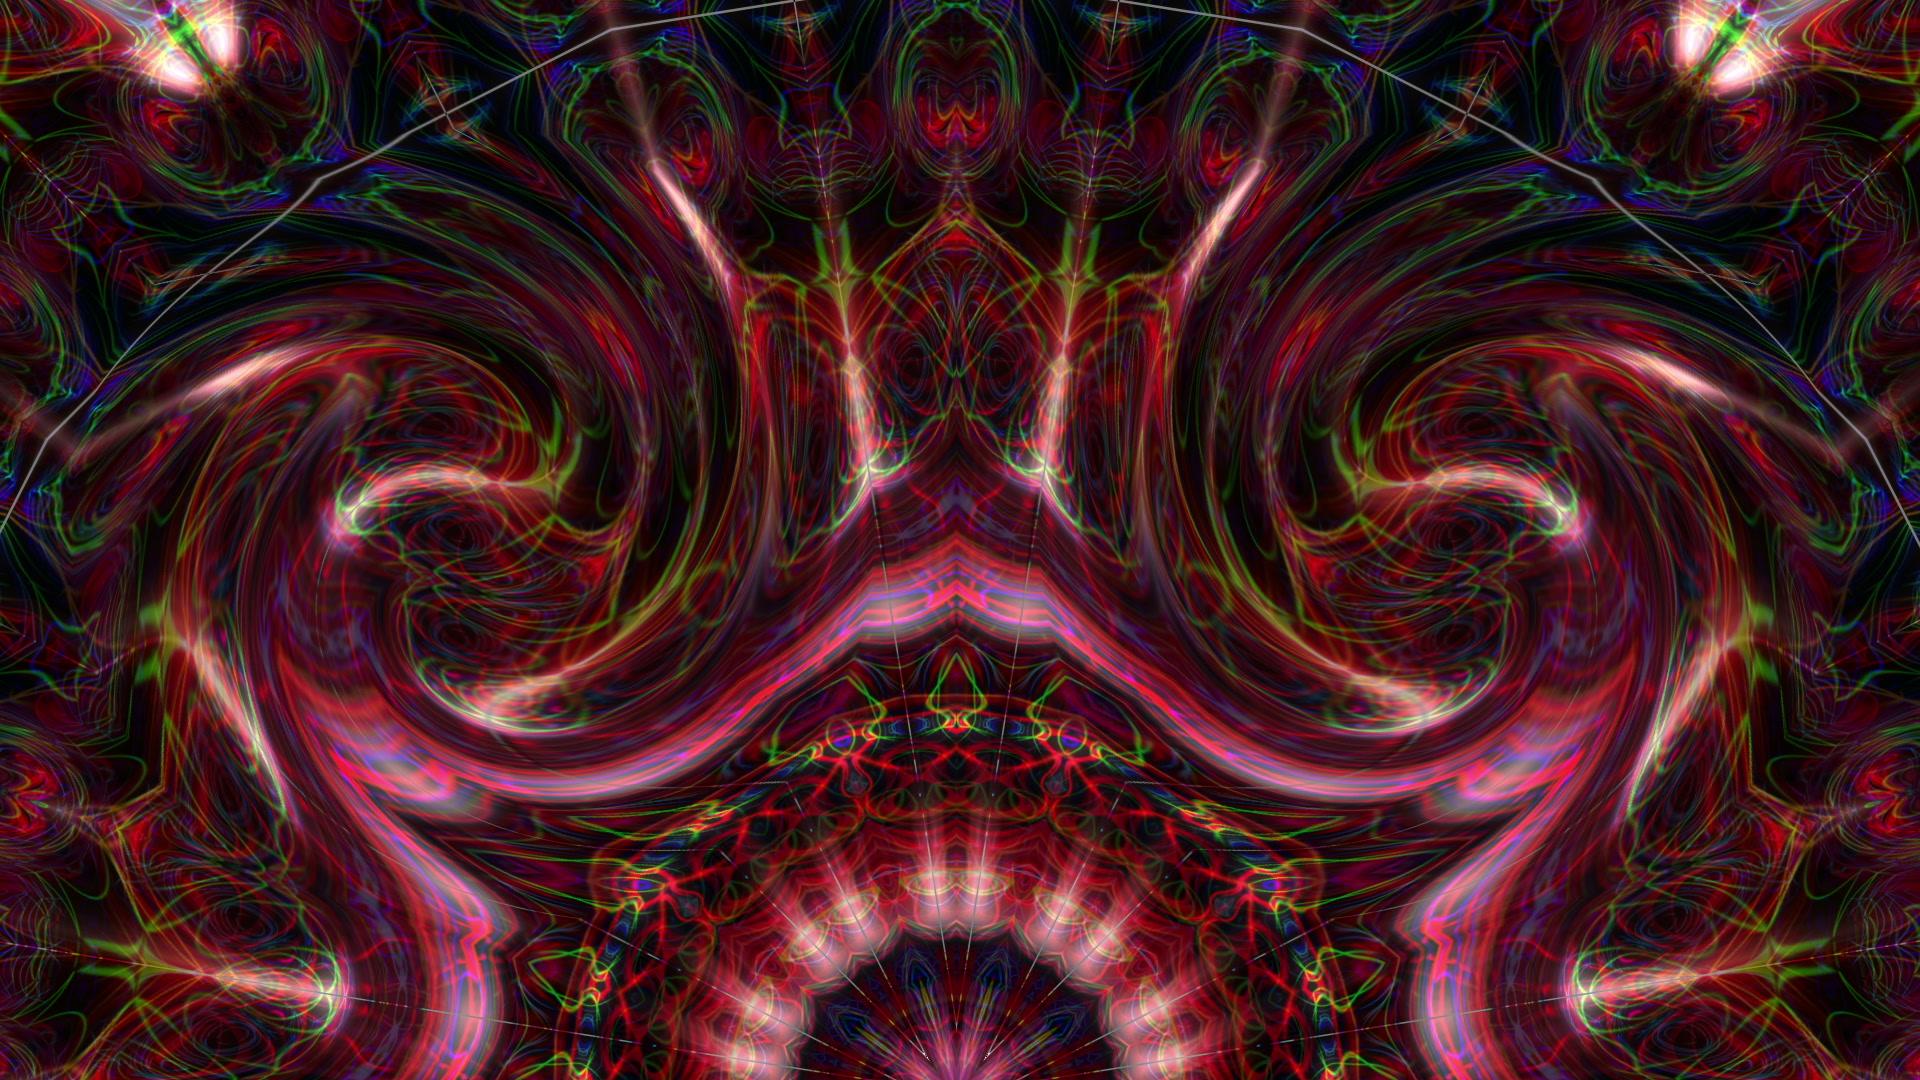 Tribal Twirl - VJ Loop  Download 60fps Full HD Visuals